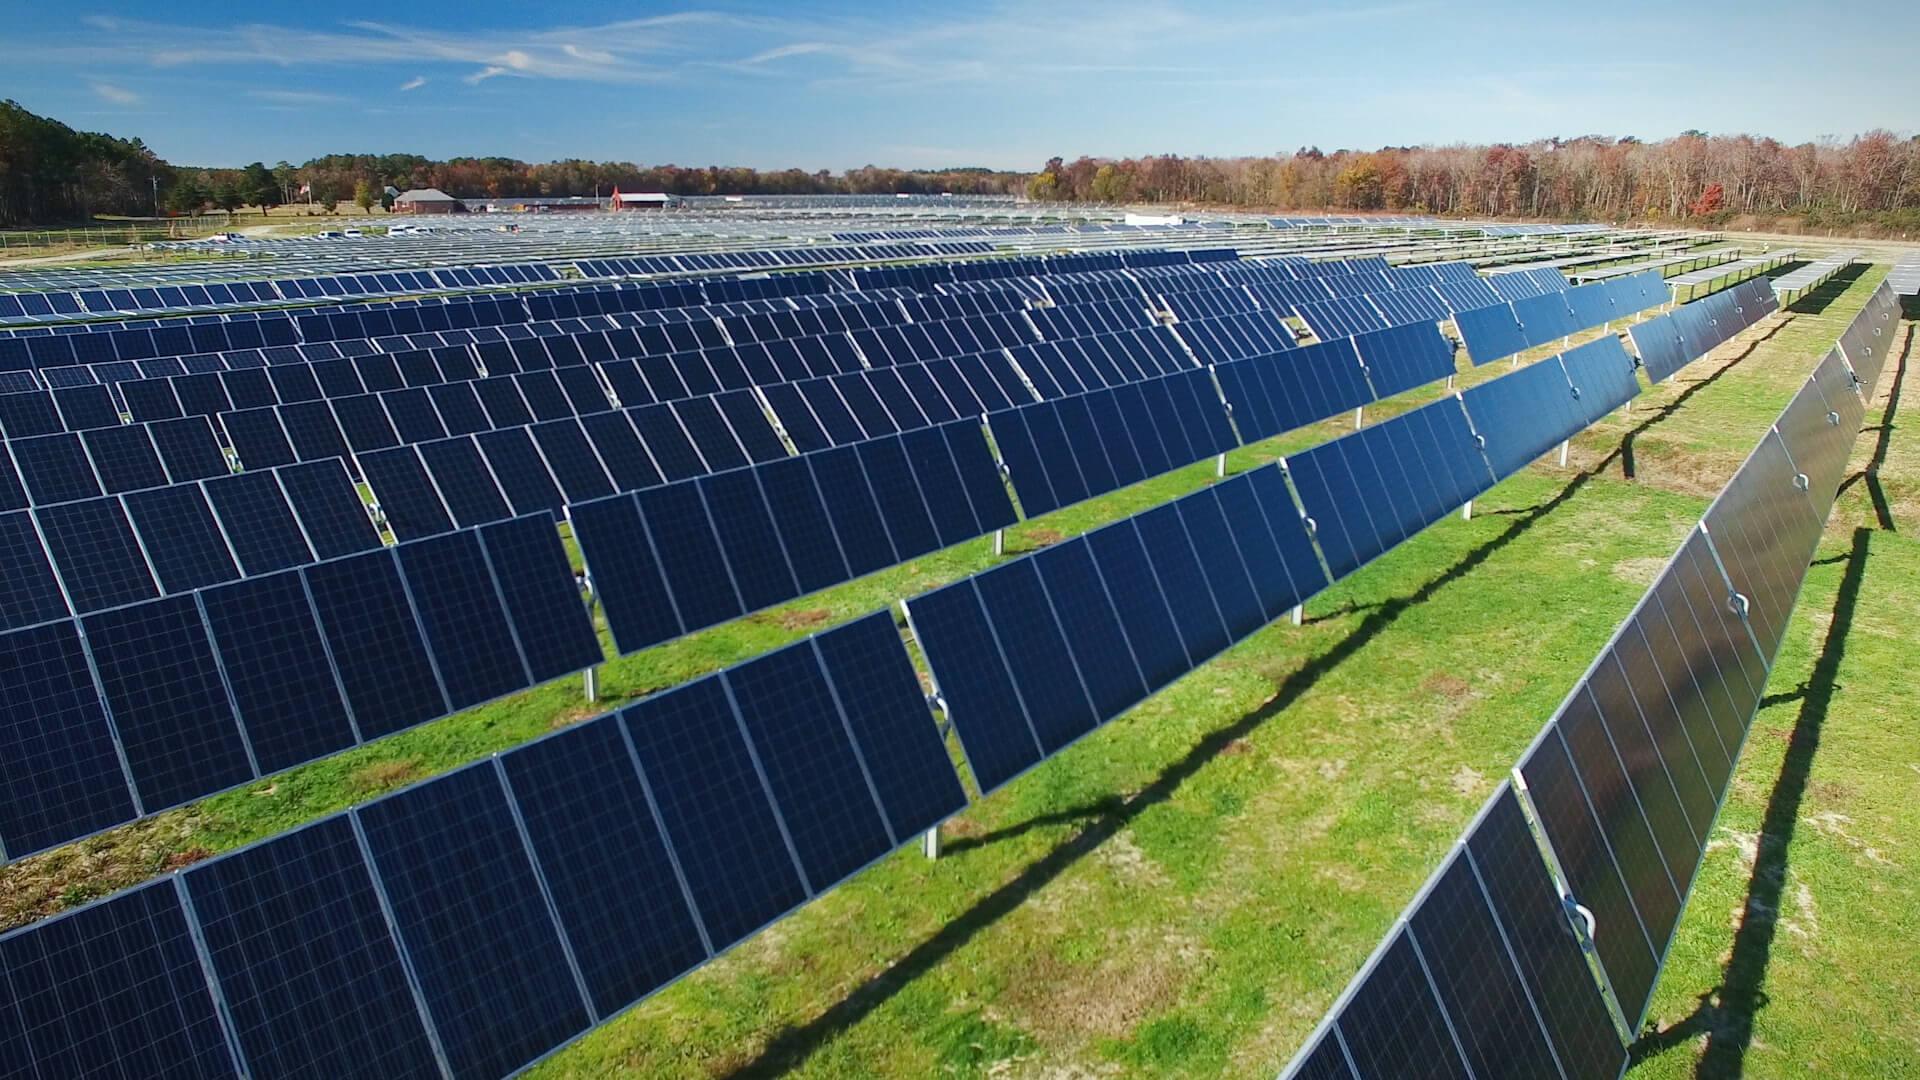 Rac Secure Planning Permission For Solar Panel Development